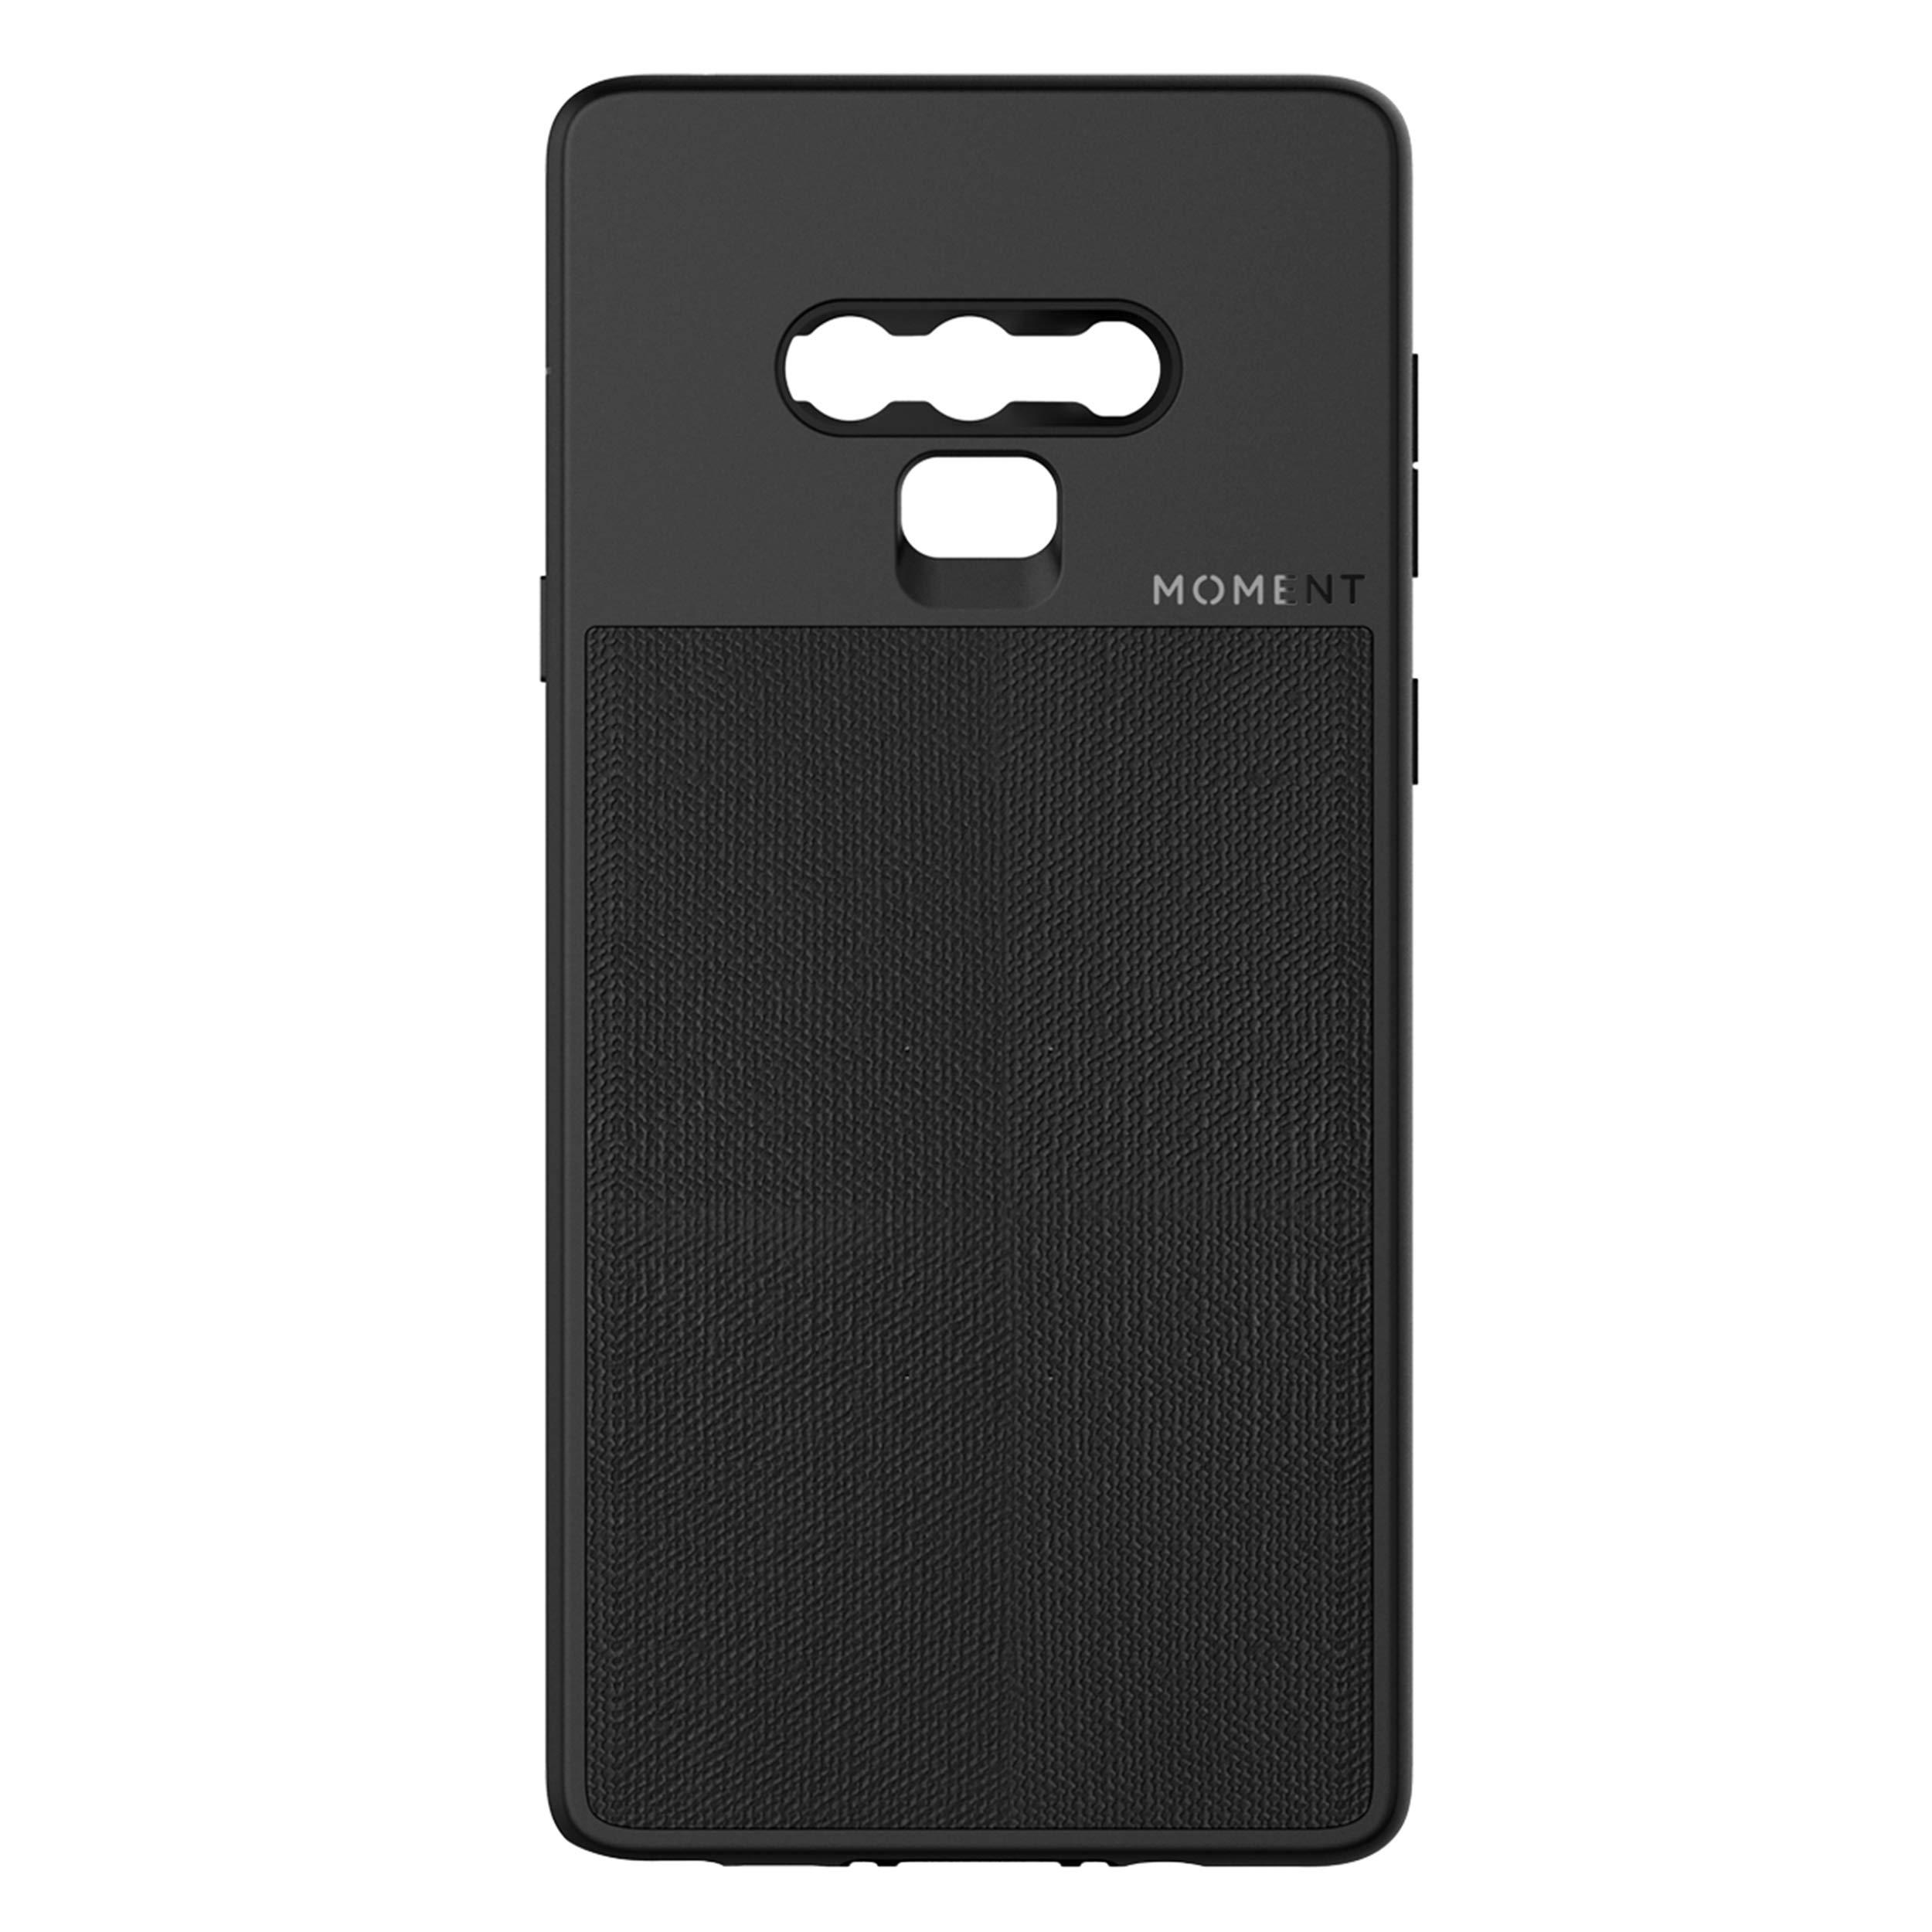 ویکالا · خرید  اصل اورجینال · خرید از آمازون · Galaxy Note 9 Case || Moment Photo Case in Black Canvas - Thin, Protective, Wrist Strap Friendly case for Camera Lovers. wekala · ویکالا